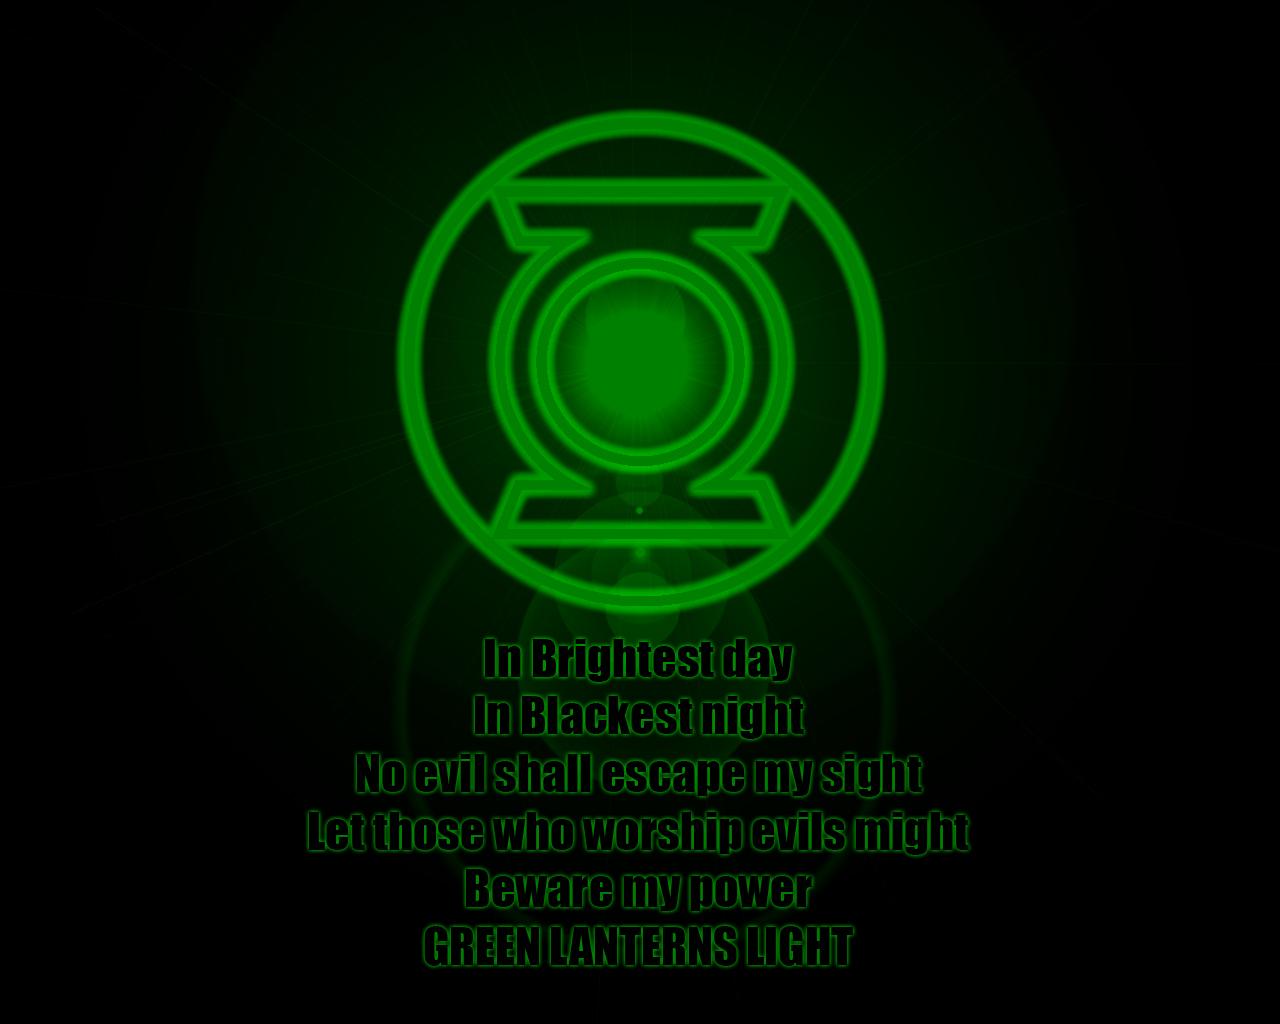 green lantern oath wallpaper - photo #9